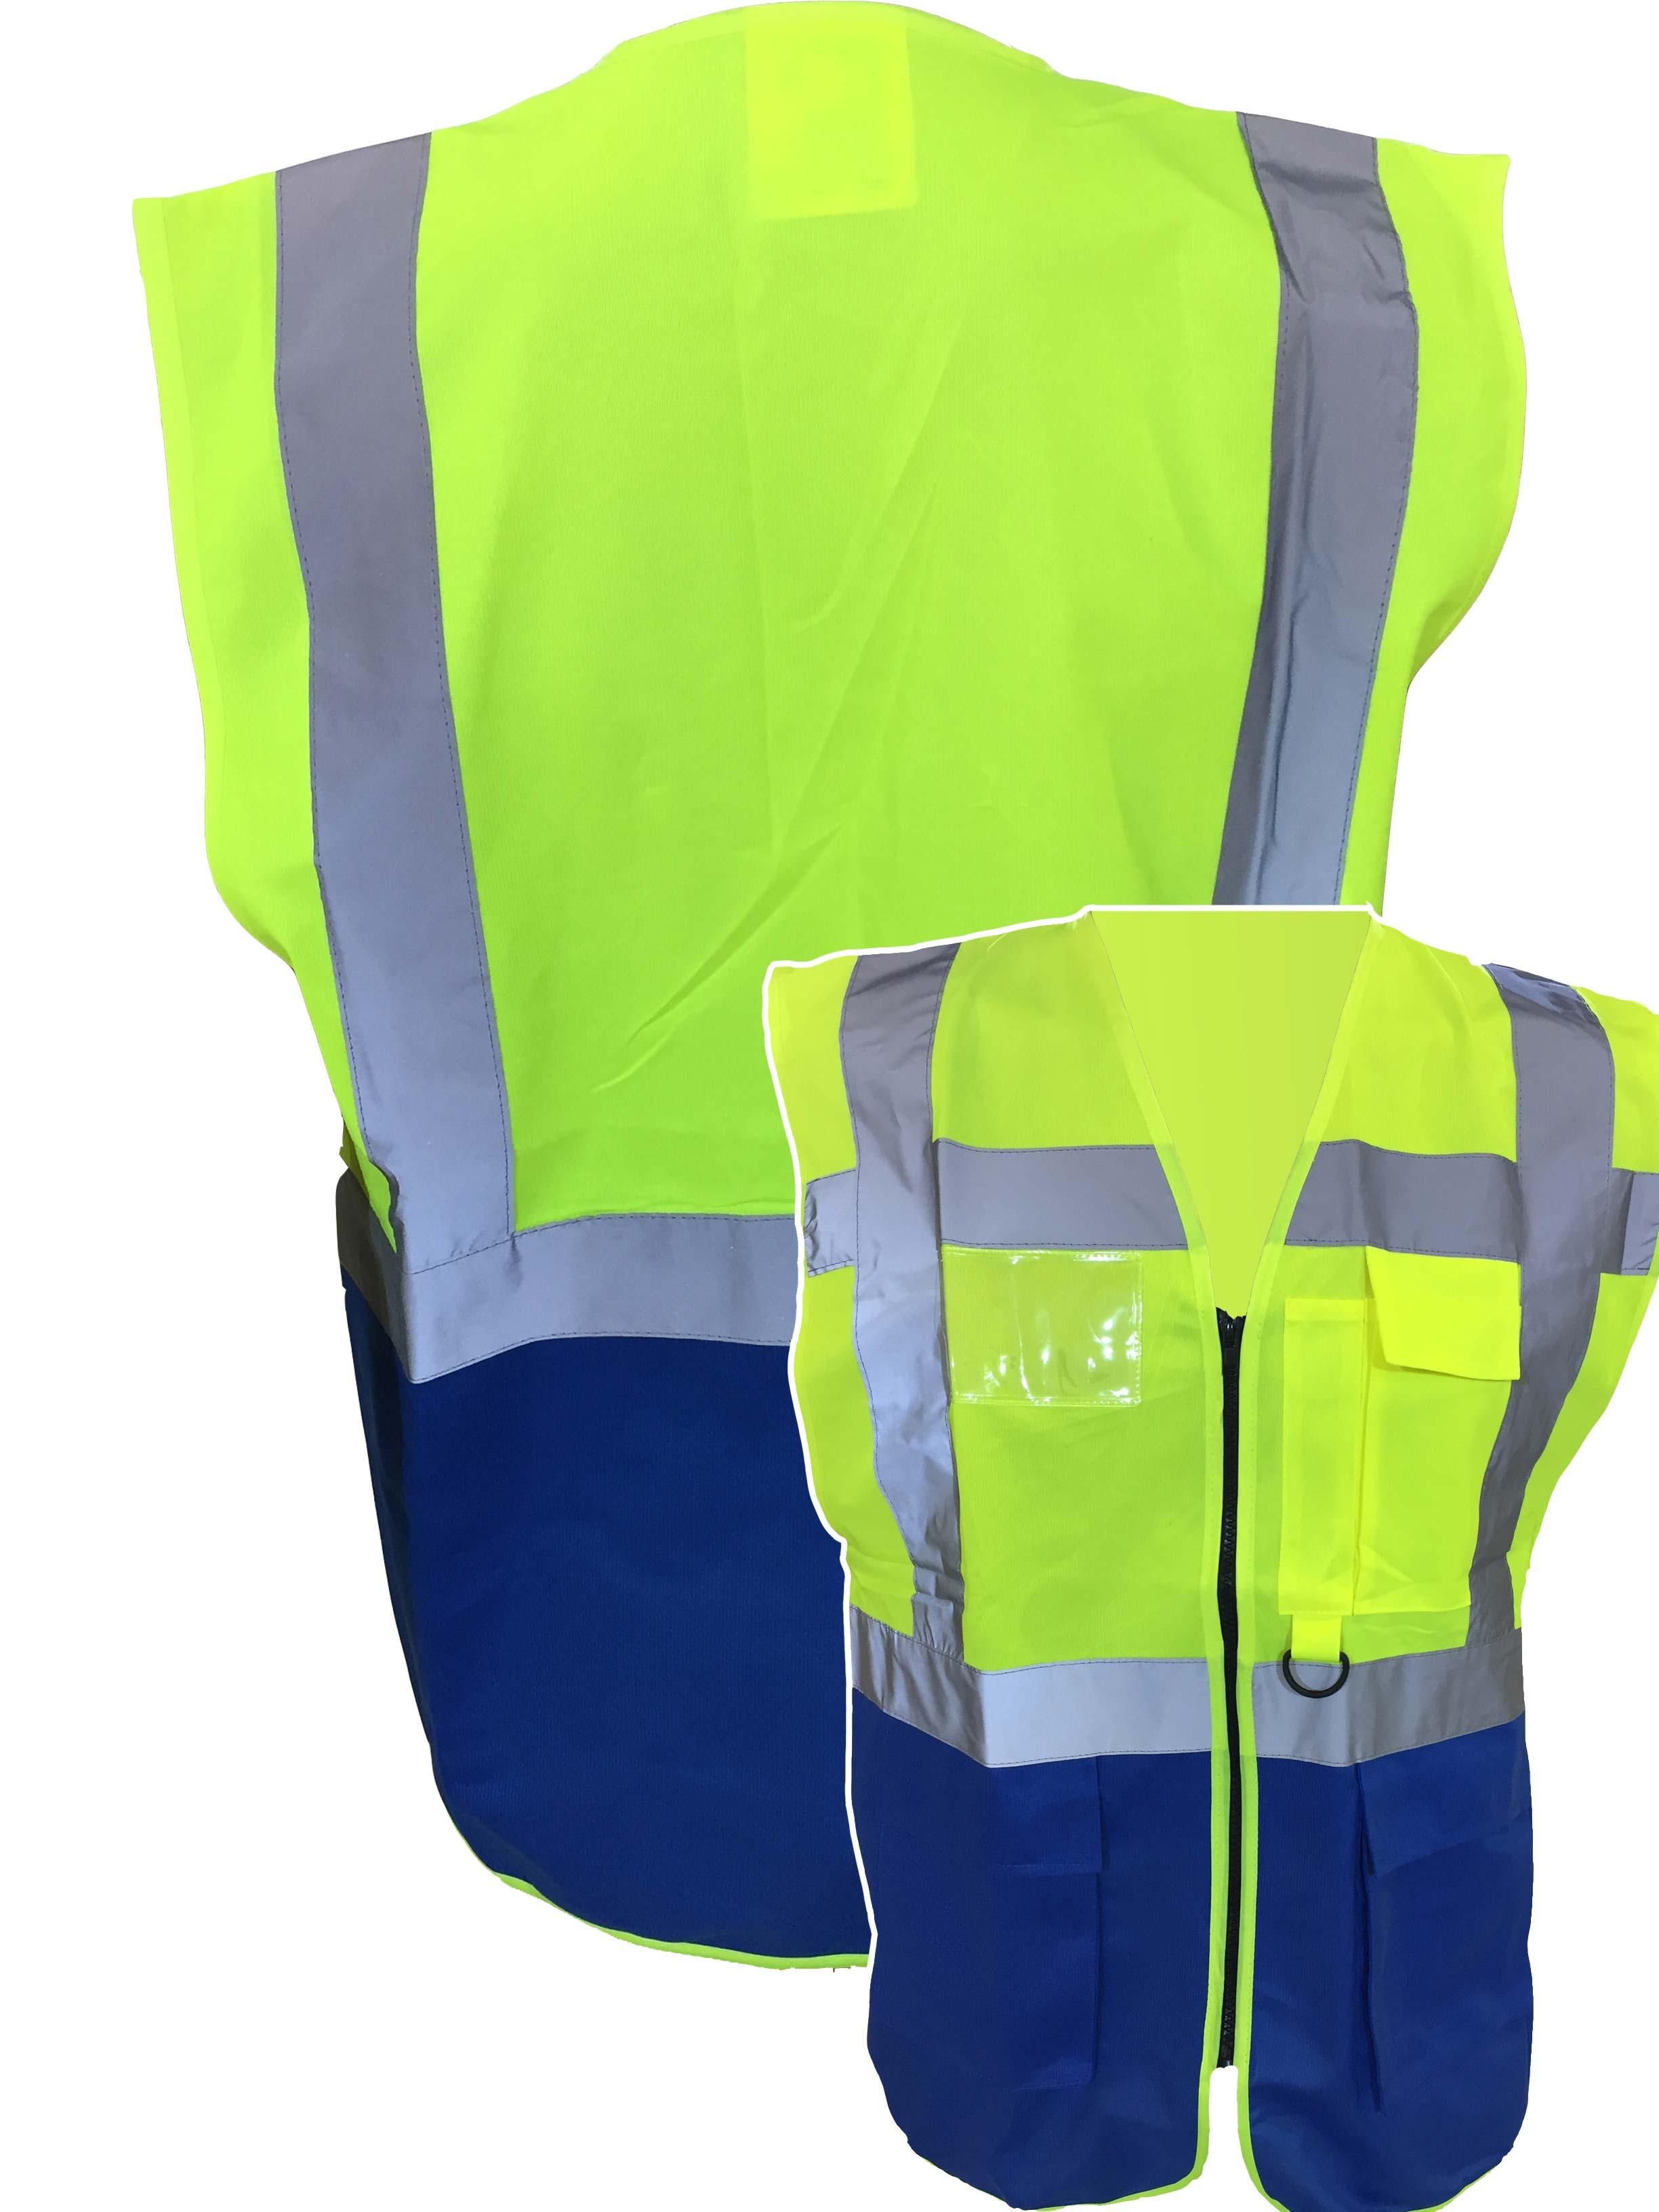 GIMP MASK FUNNY YELLOW HI VIZ VIS WAISTCOAT VEST SAFETY WORKWEAR STAG PARTY